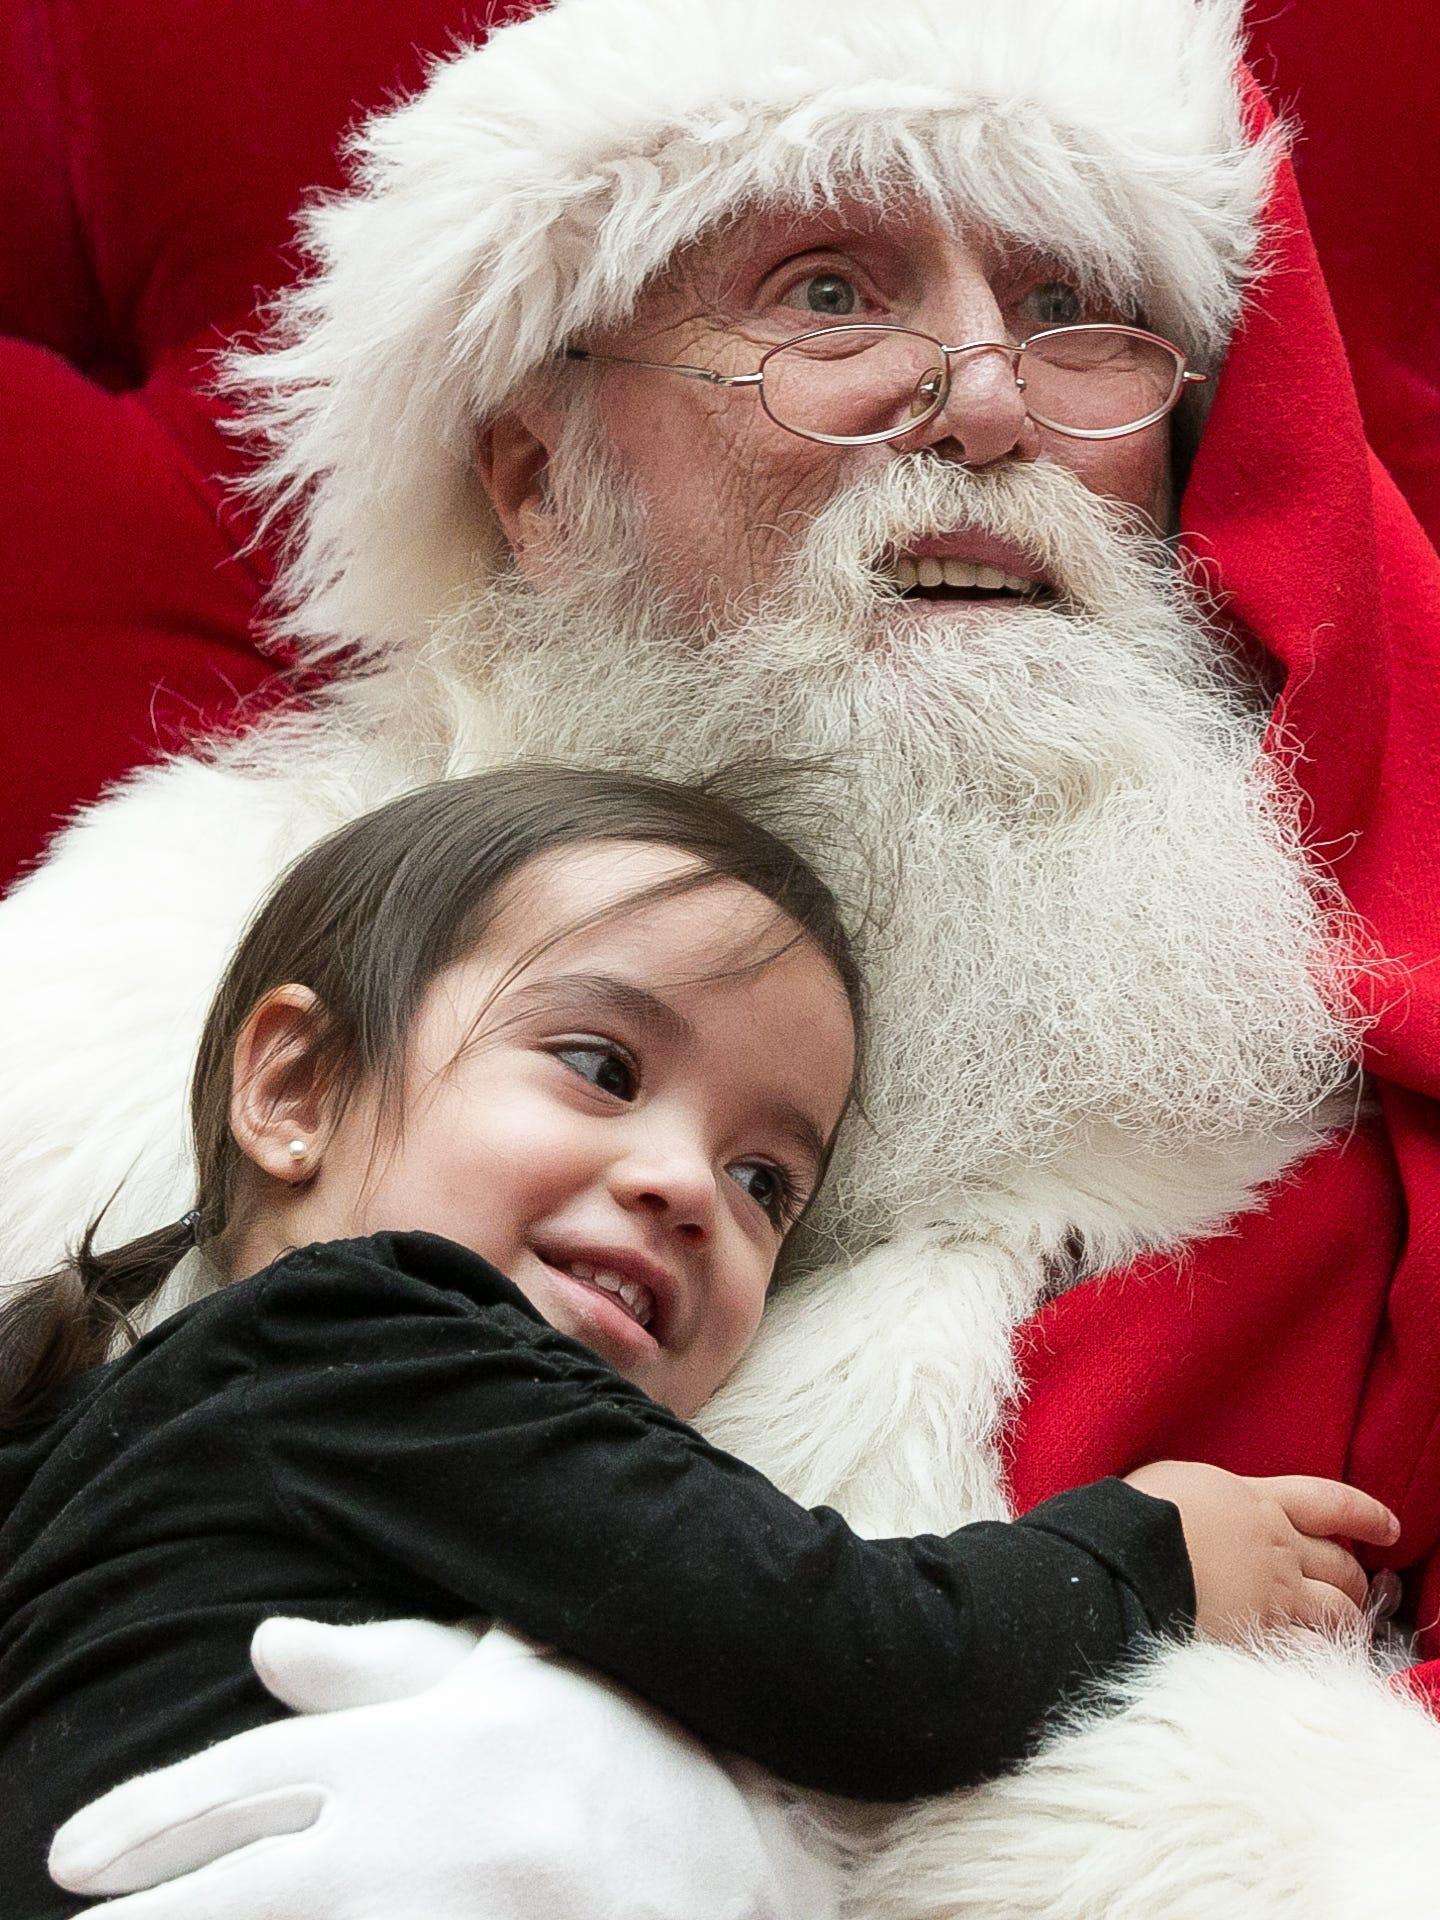 Tstars Dear Santa Leave Presents Take Sister Toddler Kids T-Shirt